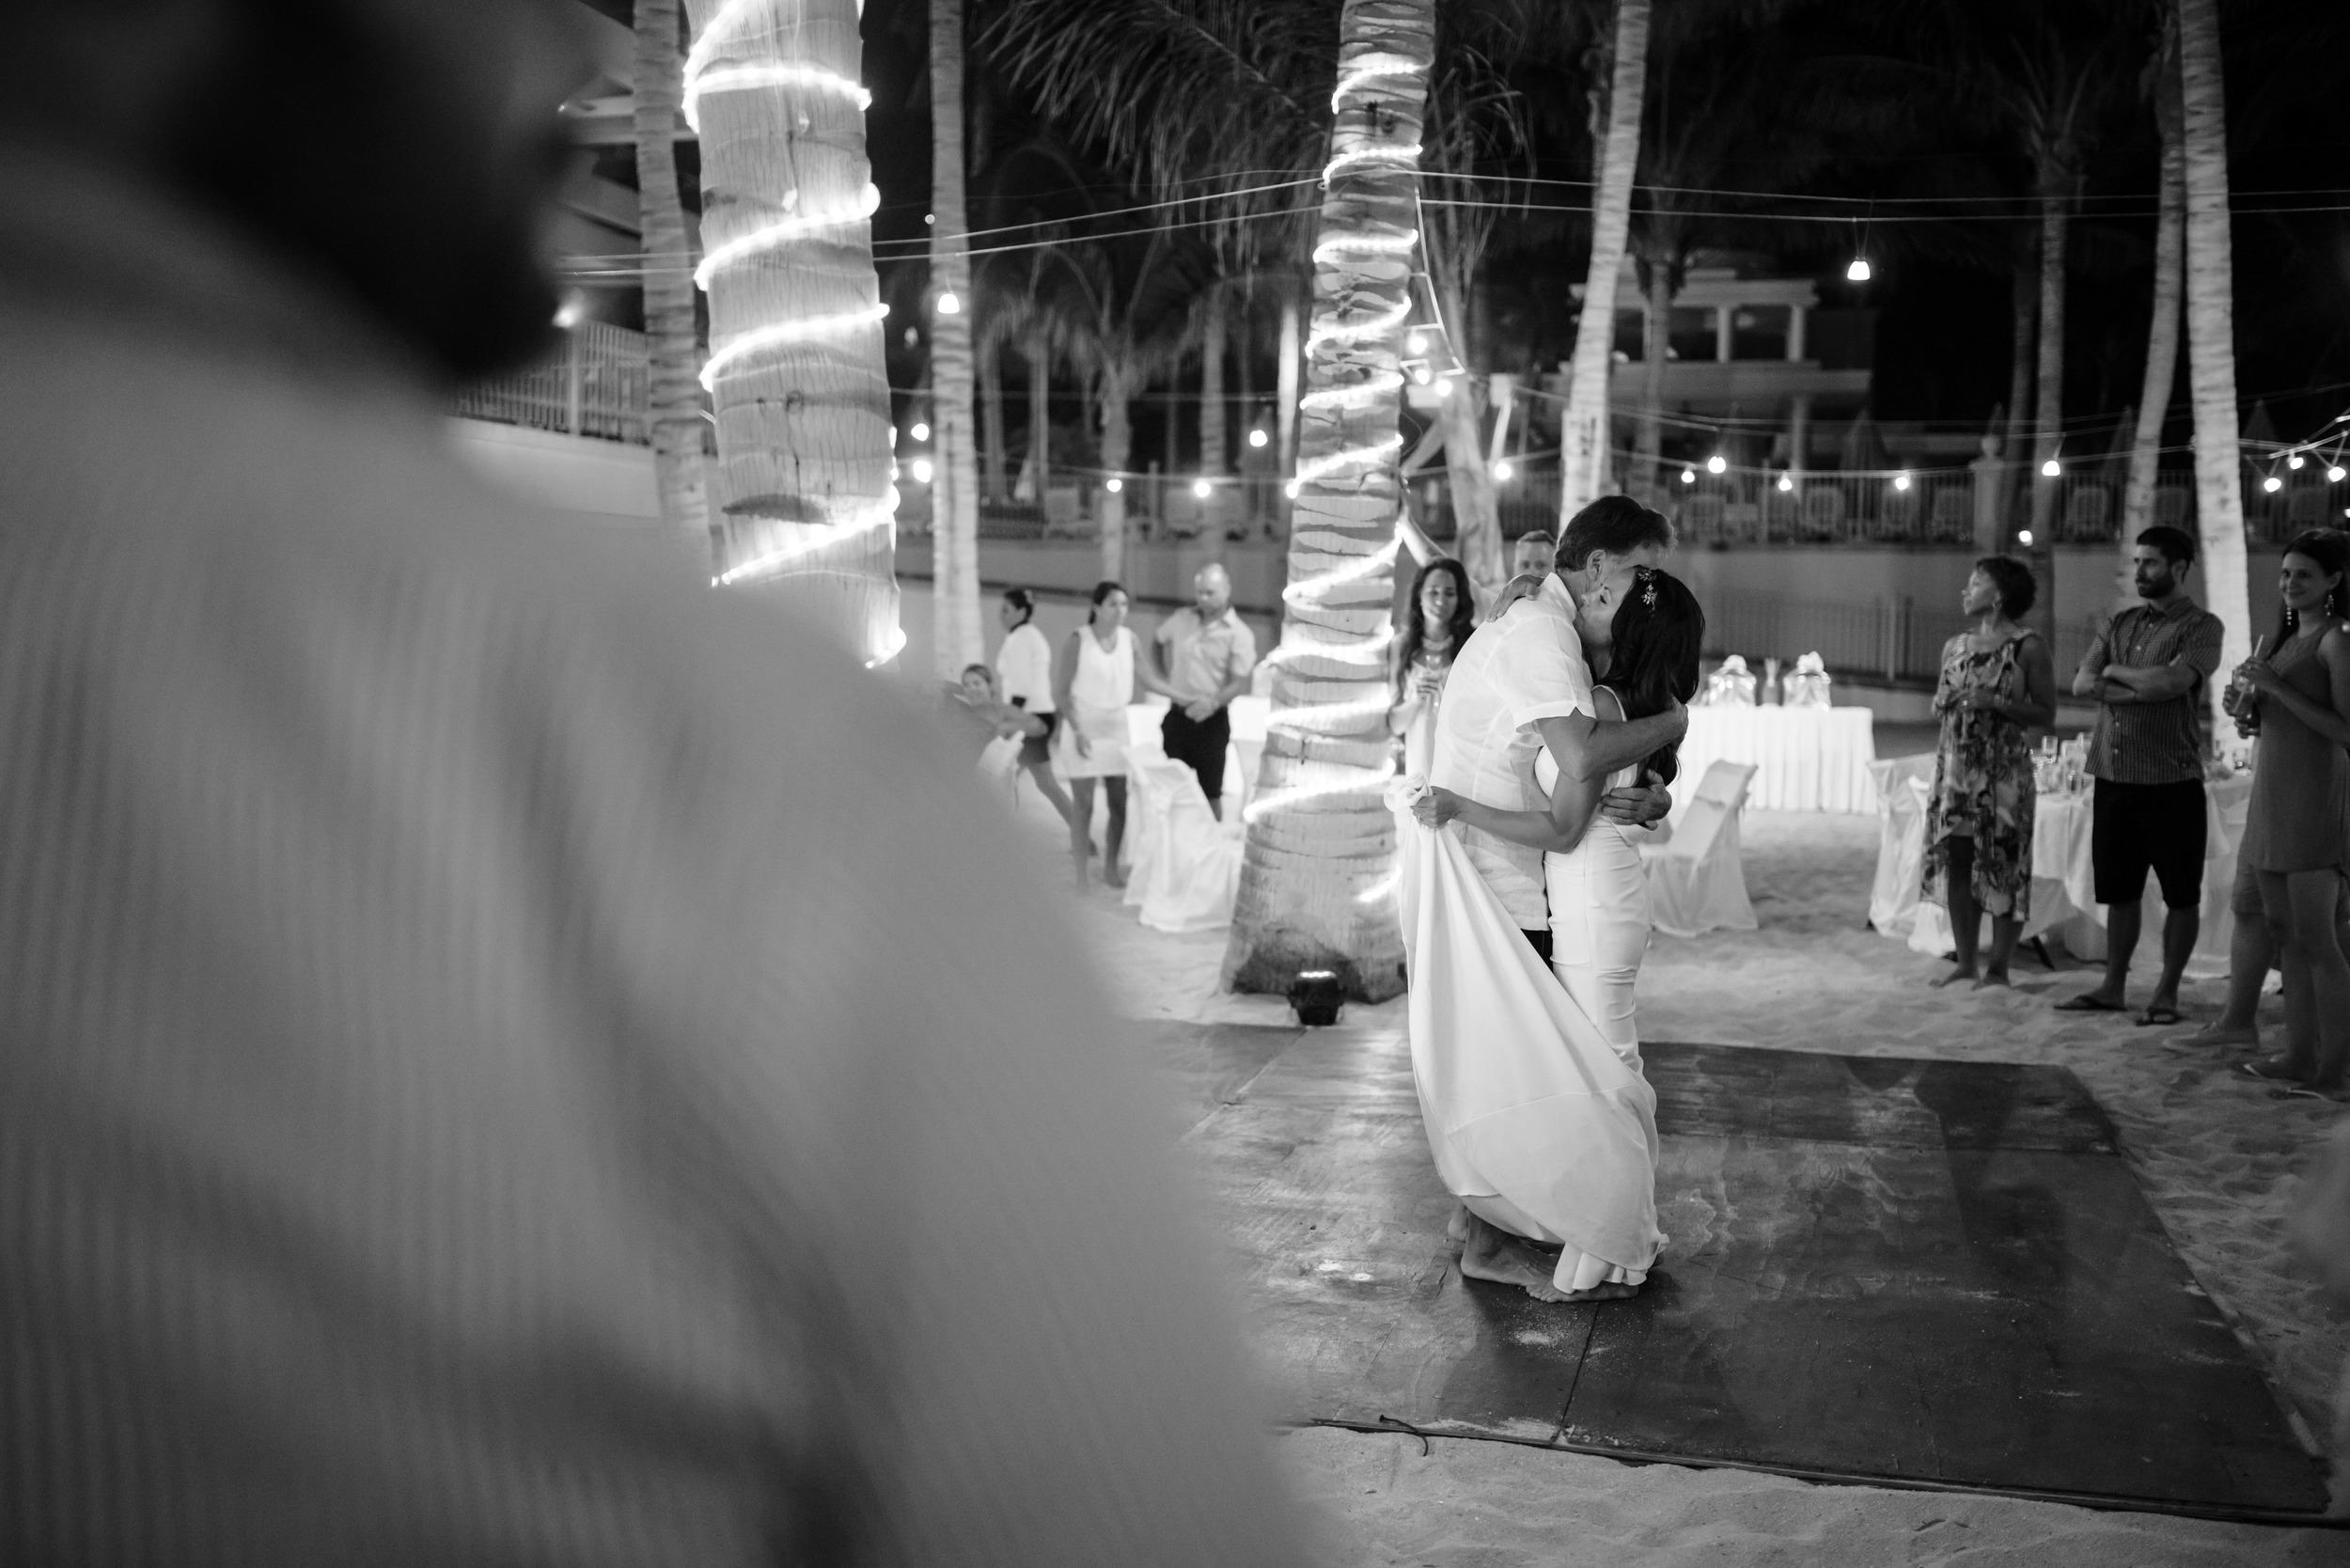 Teya_Devon_Night_Mexico_Oct15_PLP-80.jpg